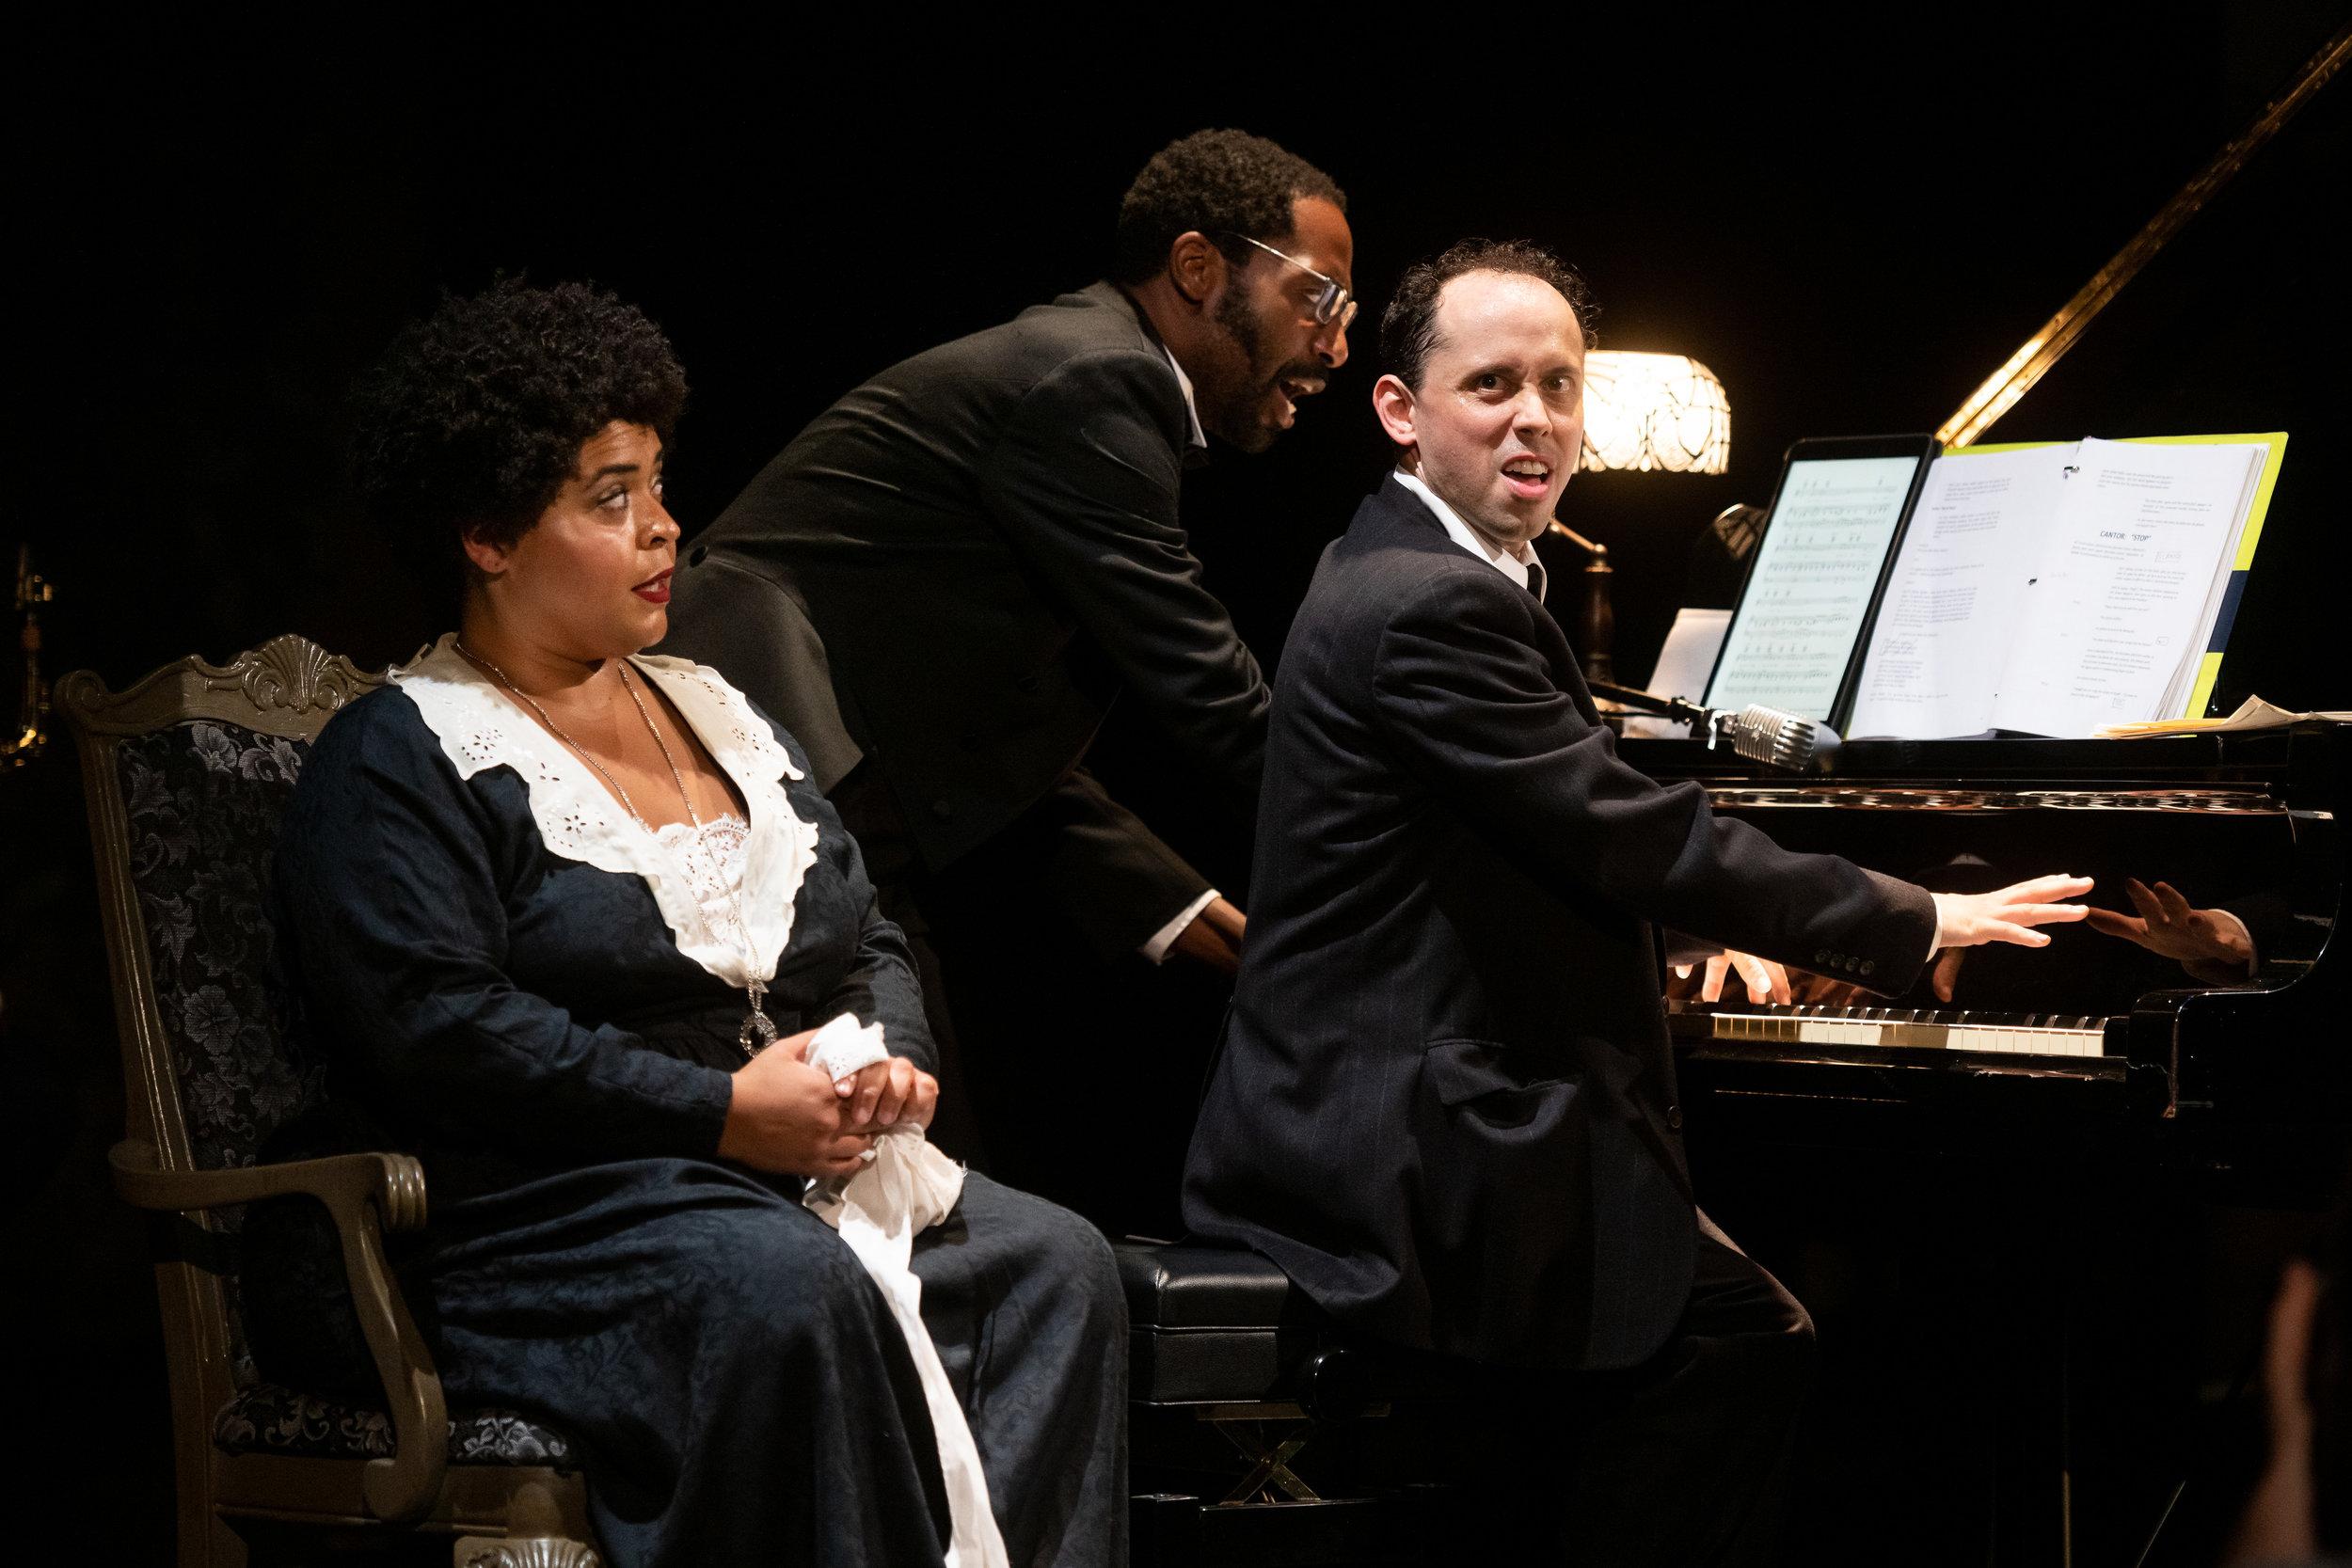 _jazz singer_featuring Cristina Pitter, Nehemiah Luckett and Joshua William Gelb_CREDIT IAN DOUGLAS.jpg.jpg